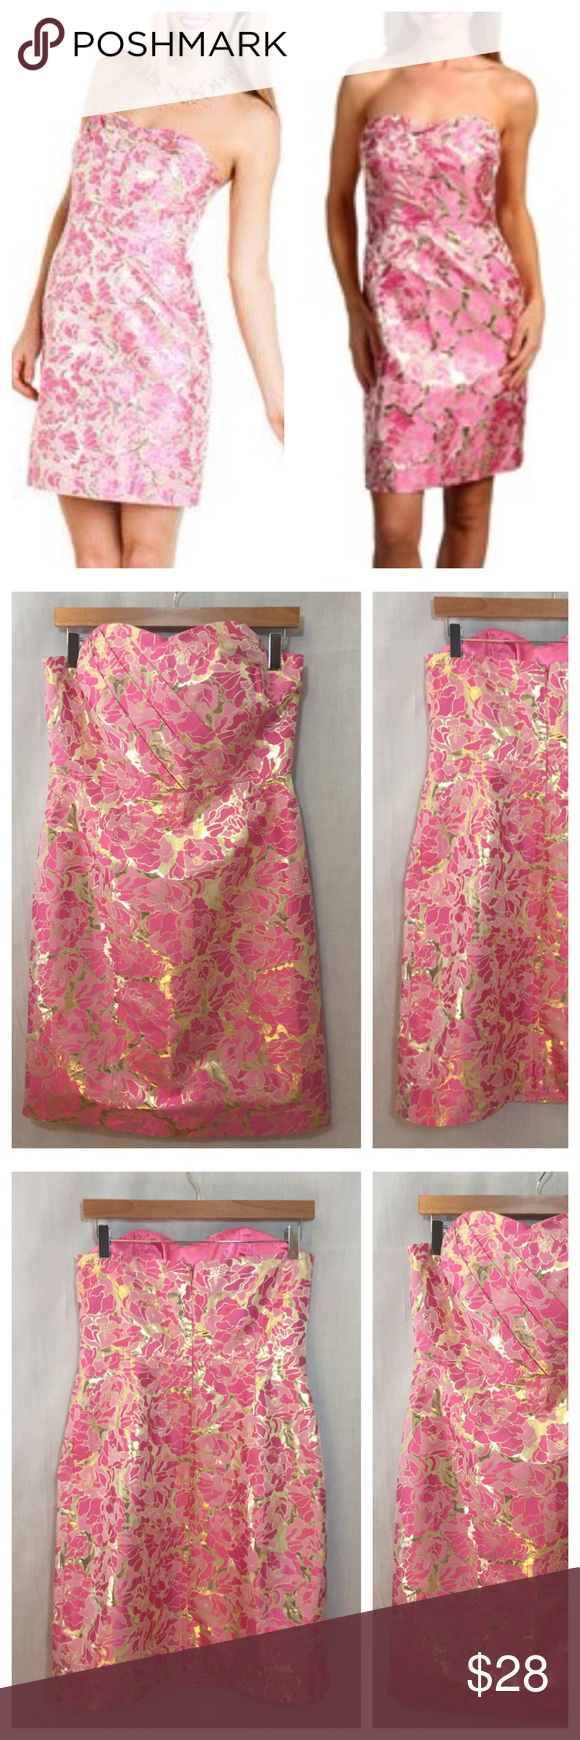 eda3af5c55a Lilly Pulitzer Raya Floral Silk Jacquard Dress 10 Lilly Pulitzer Raya Pink  Gold Floral Silk Metallic Jacquard Strapless Dress • Sz 10 • Boning in  bodice ...